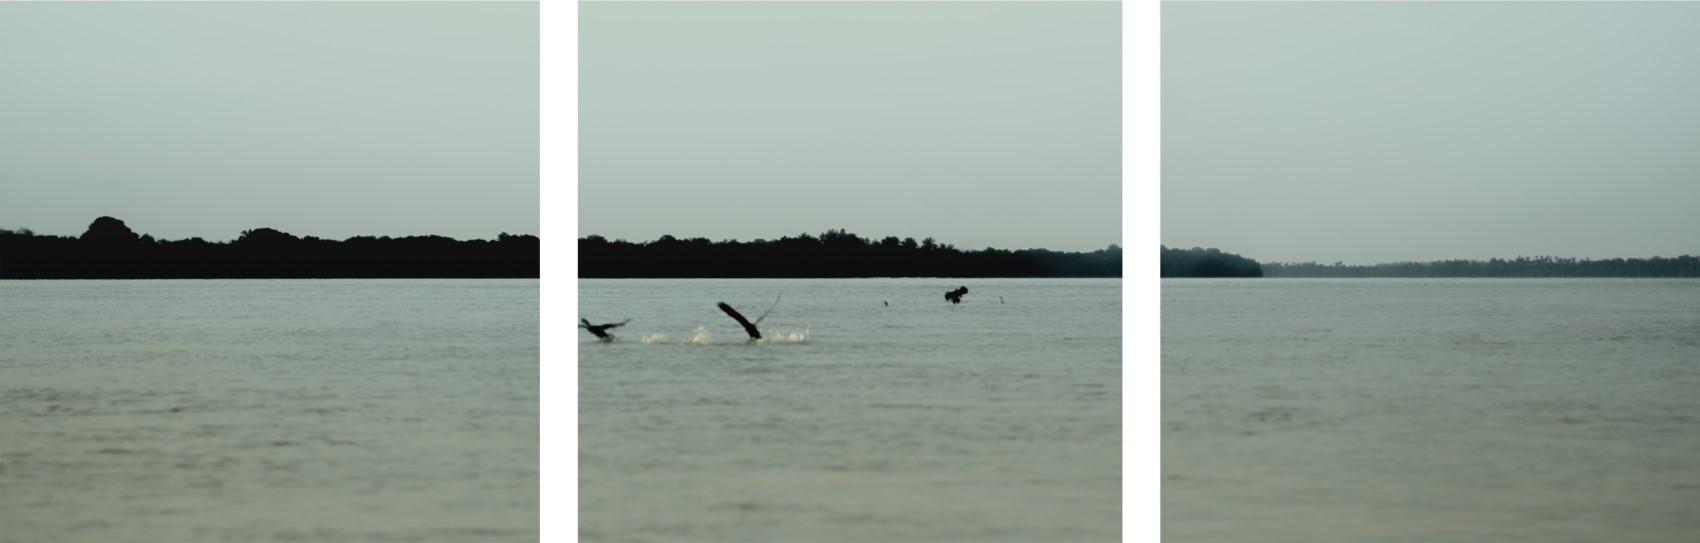 Pássaros voando - TO - Brasil